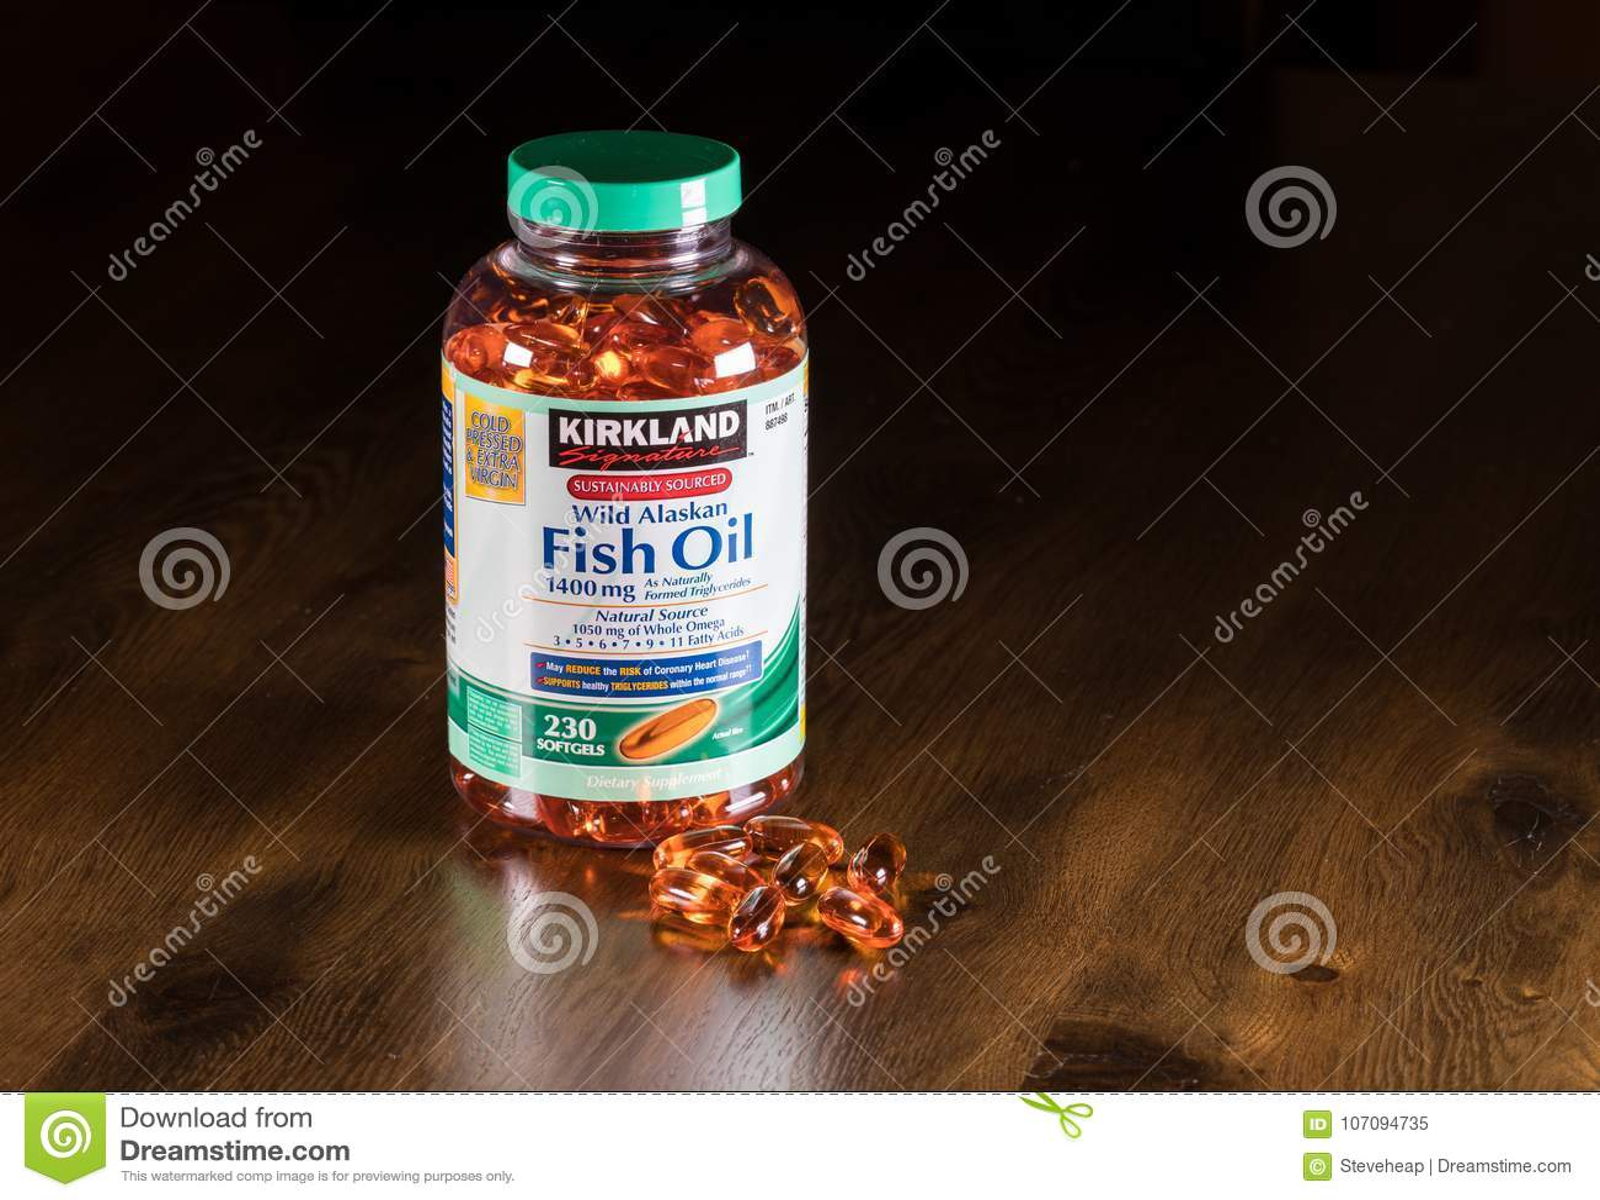 Garrafa de óleo de Kirkland Signature Wild Alaskan Fish